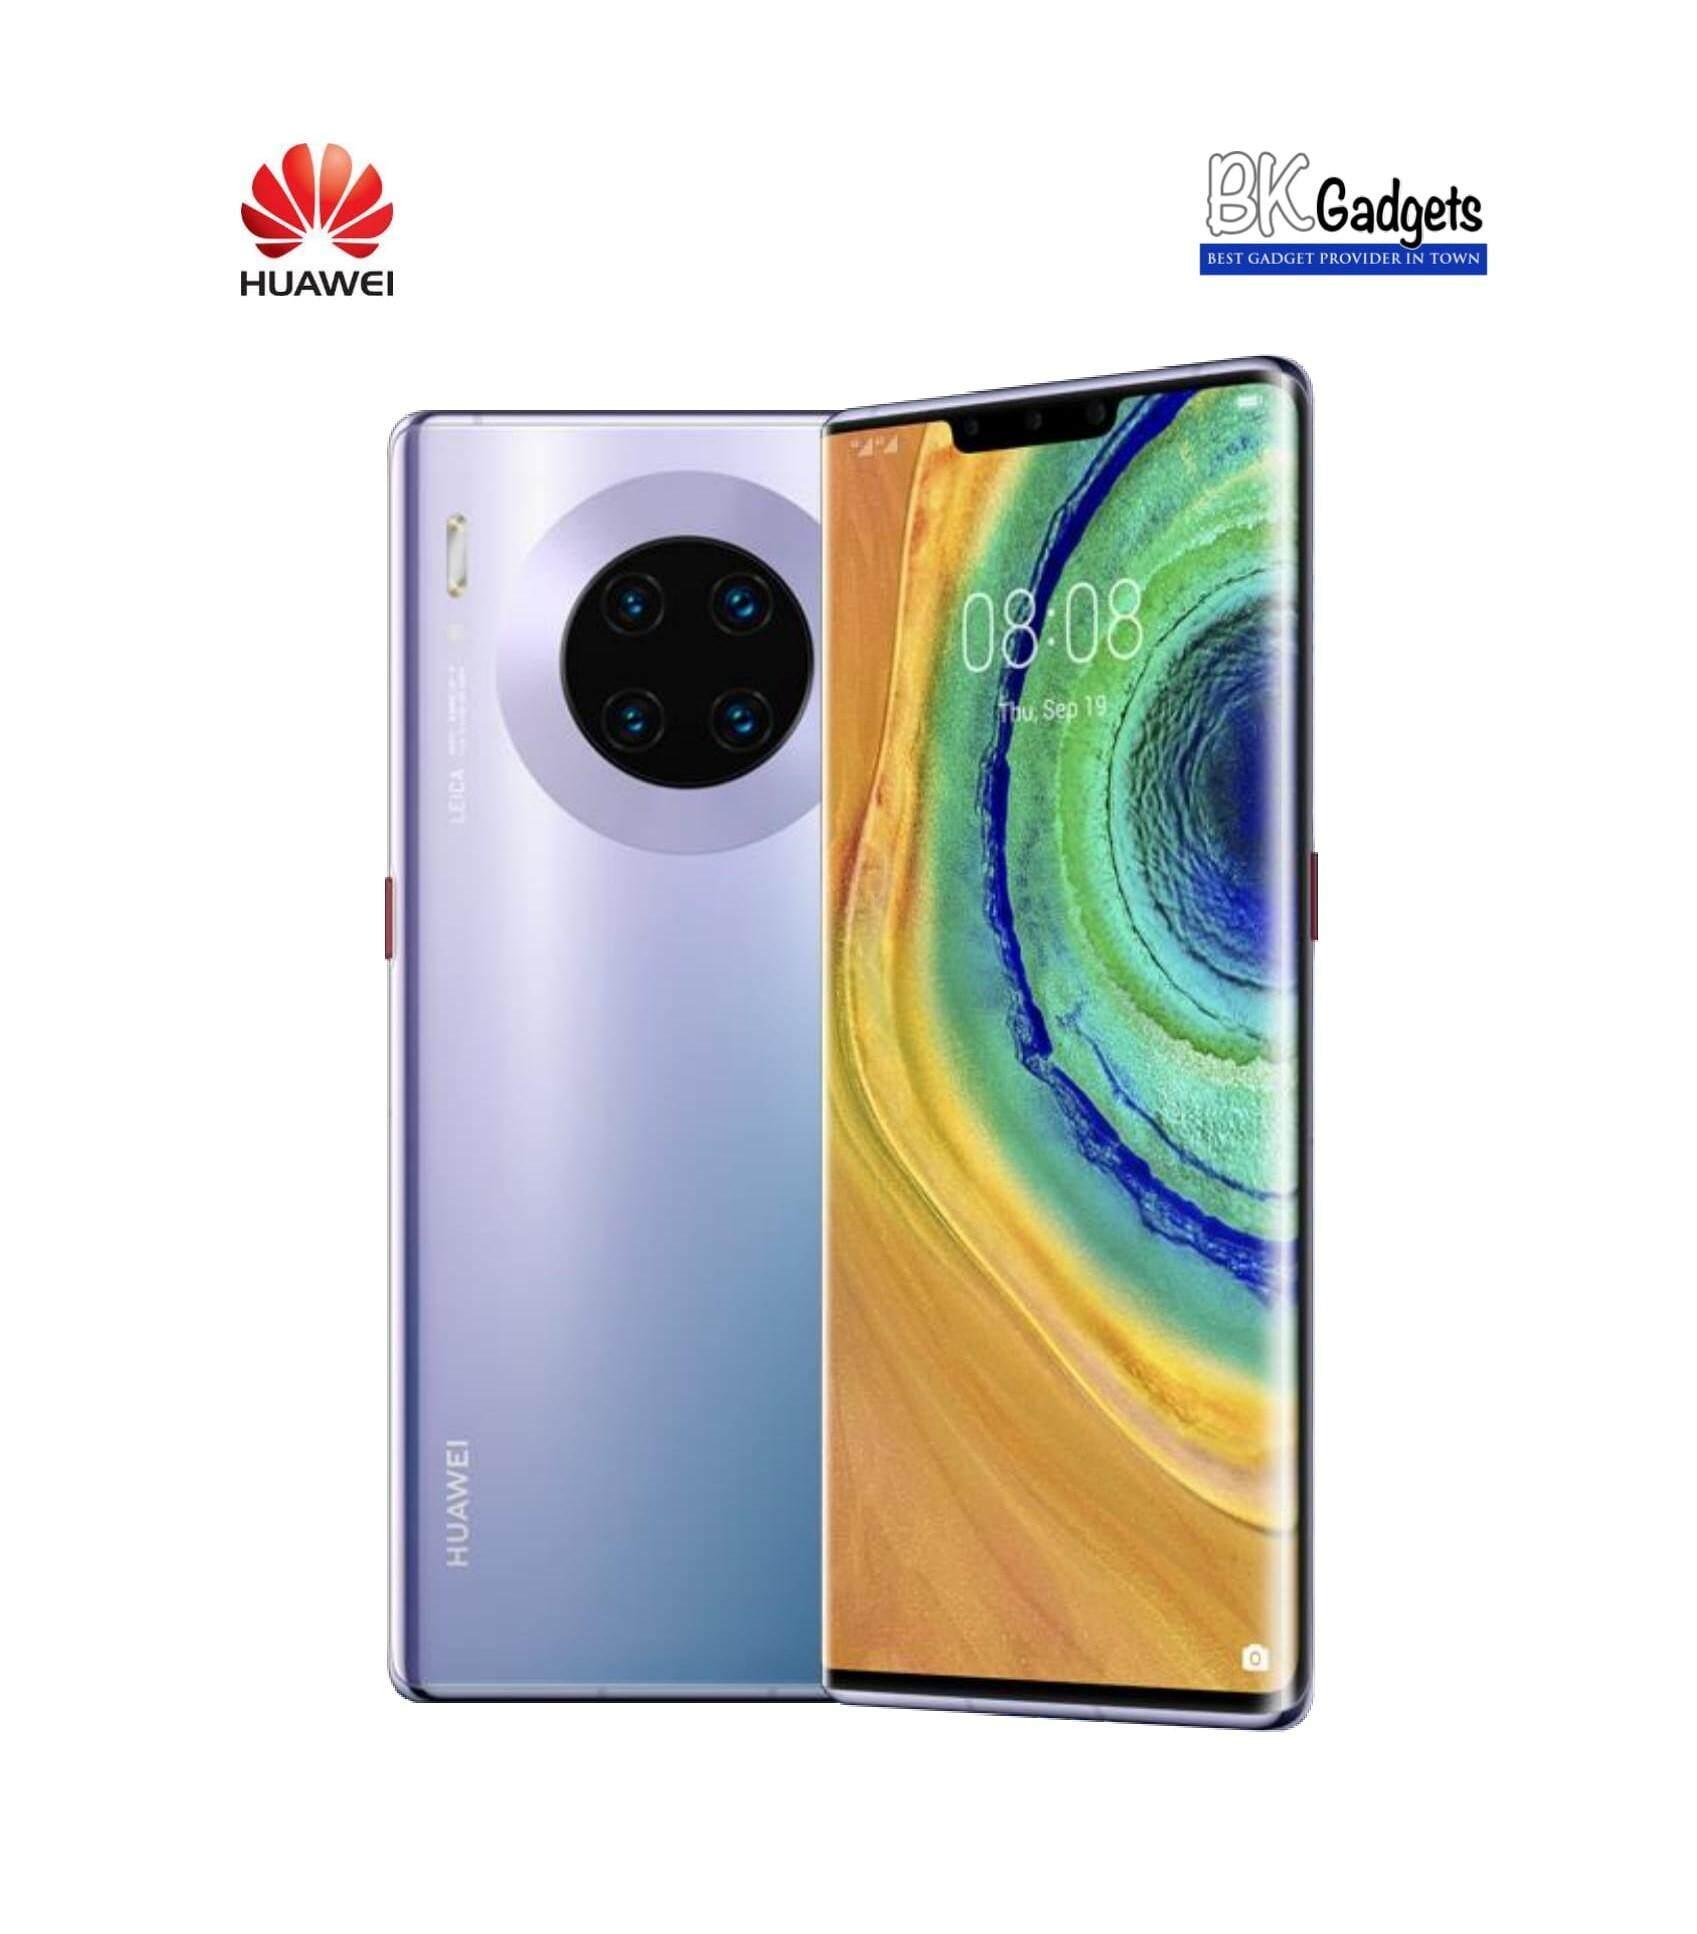 HUAWEI Mate 30 Space Silver [ 8GB + 128GB ] Smartphone